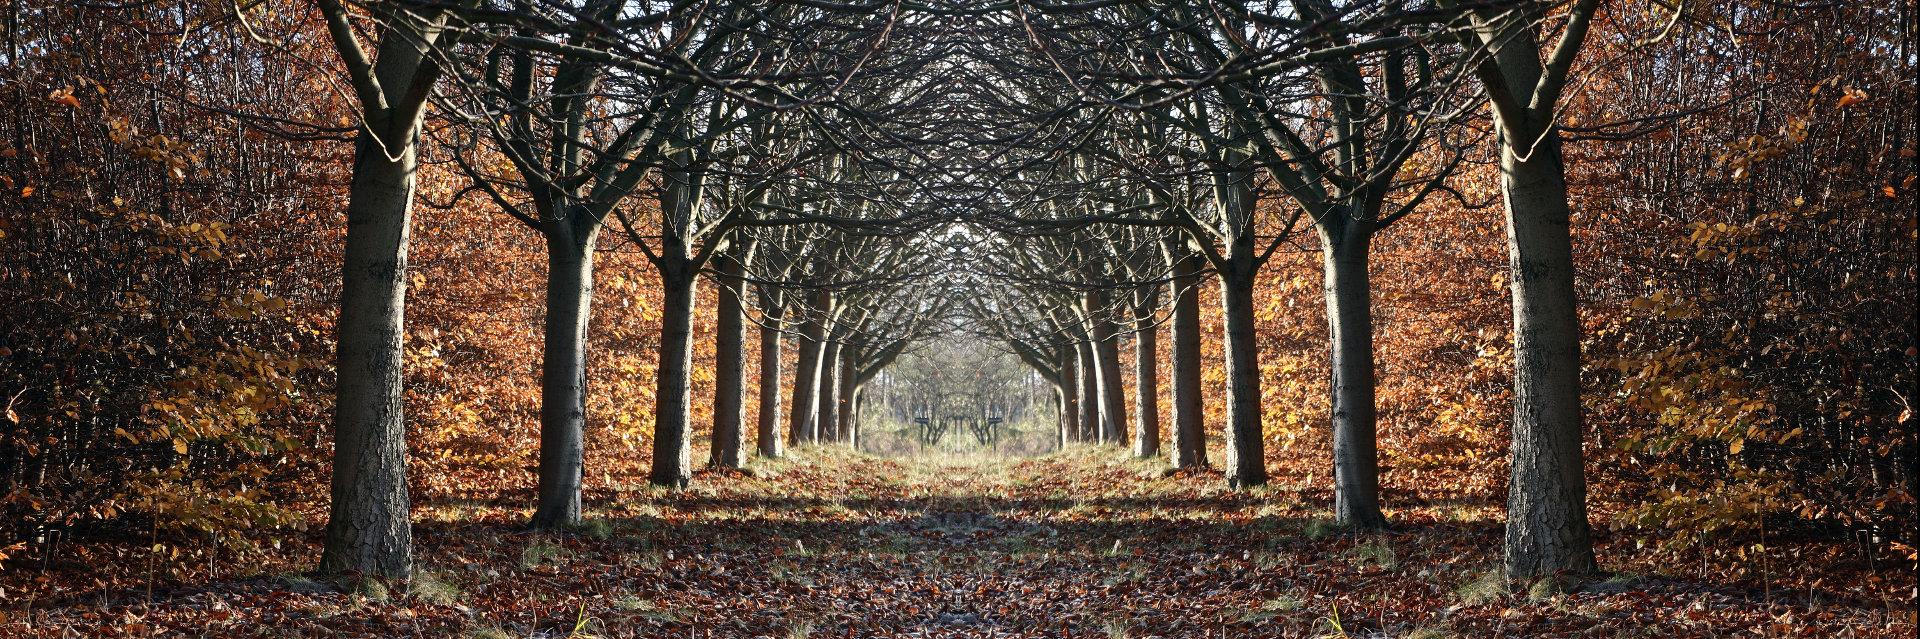 DANISH LANDSCAPE © Jean Schweitzer | Dreamstime.com